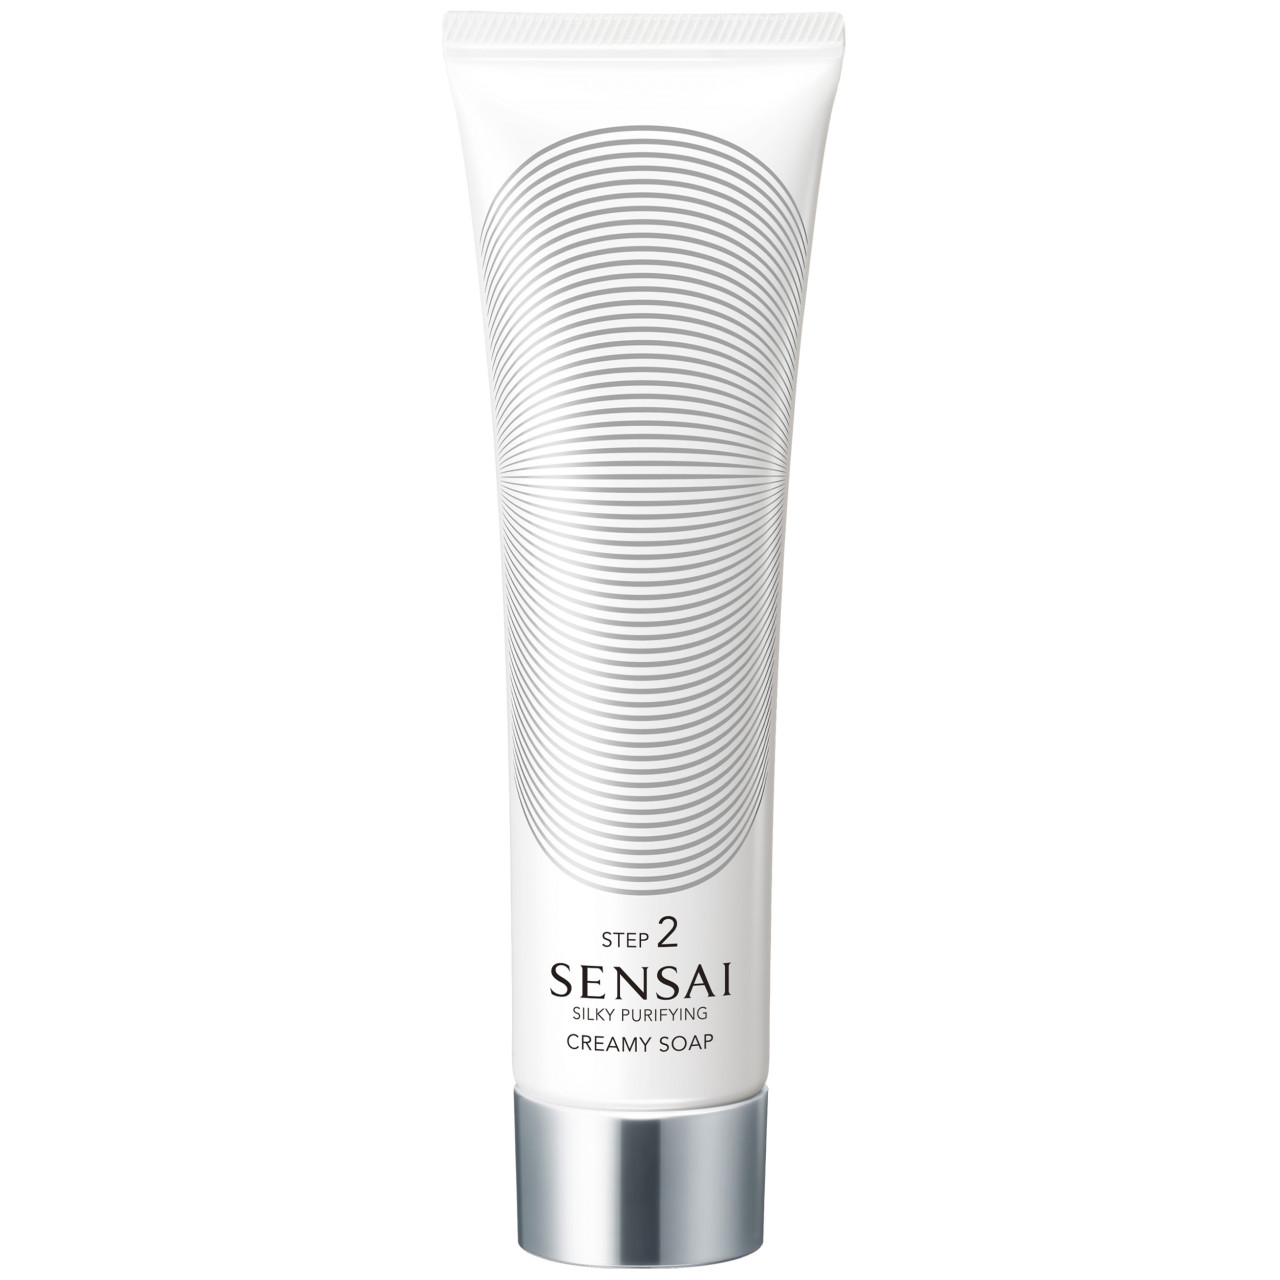 Sensai CREAMY SOAP